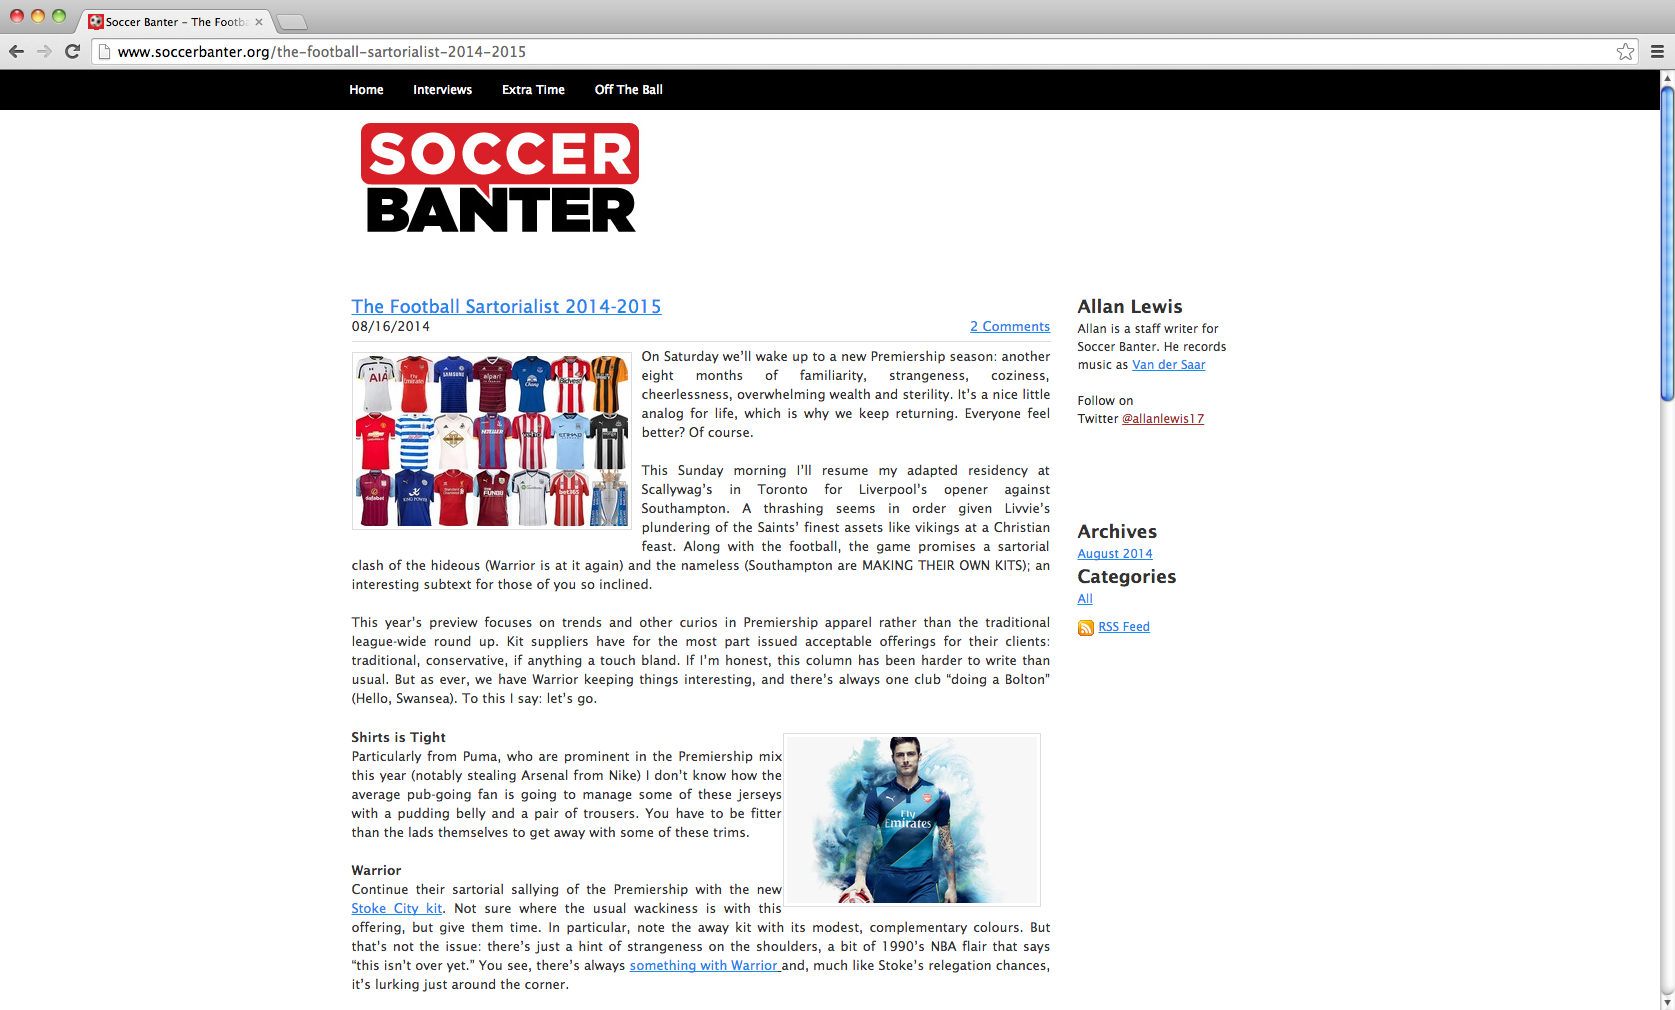 Soccer Banter - The Football Sartorialist